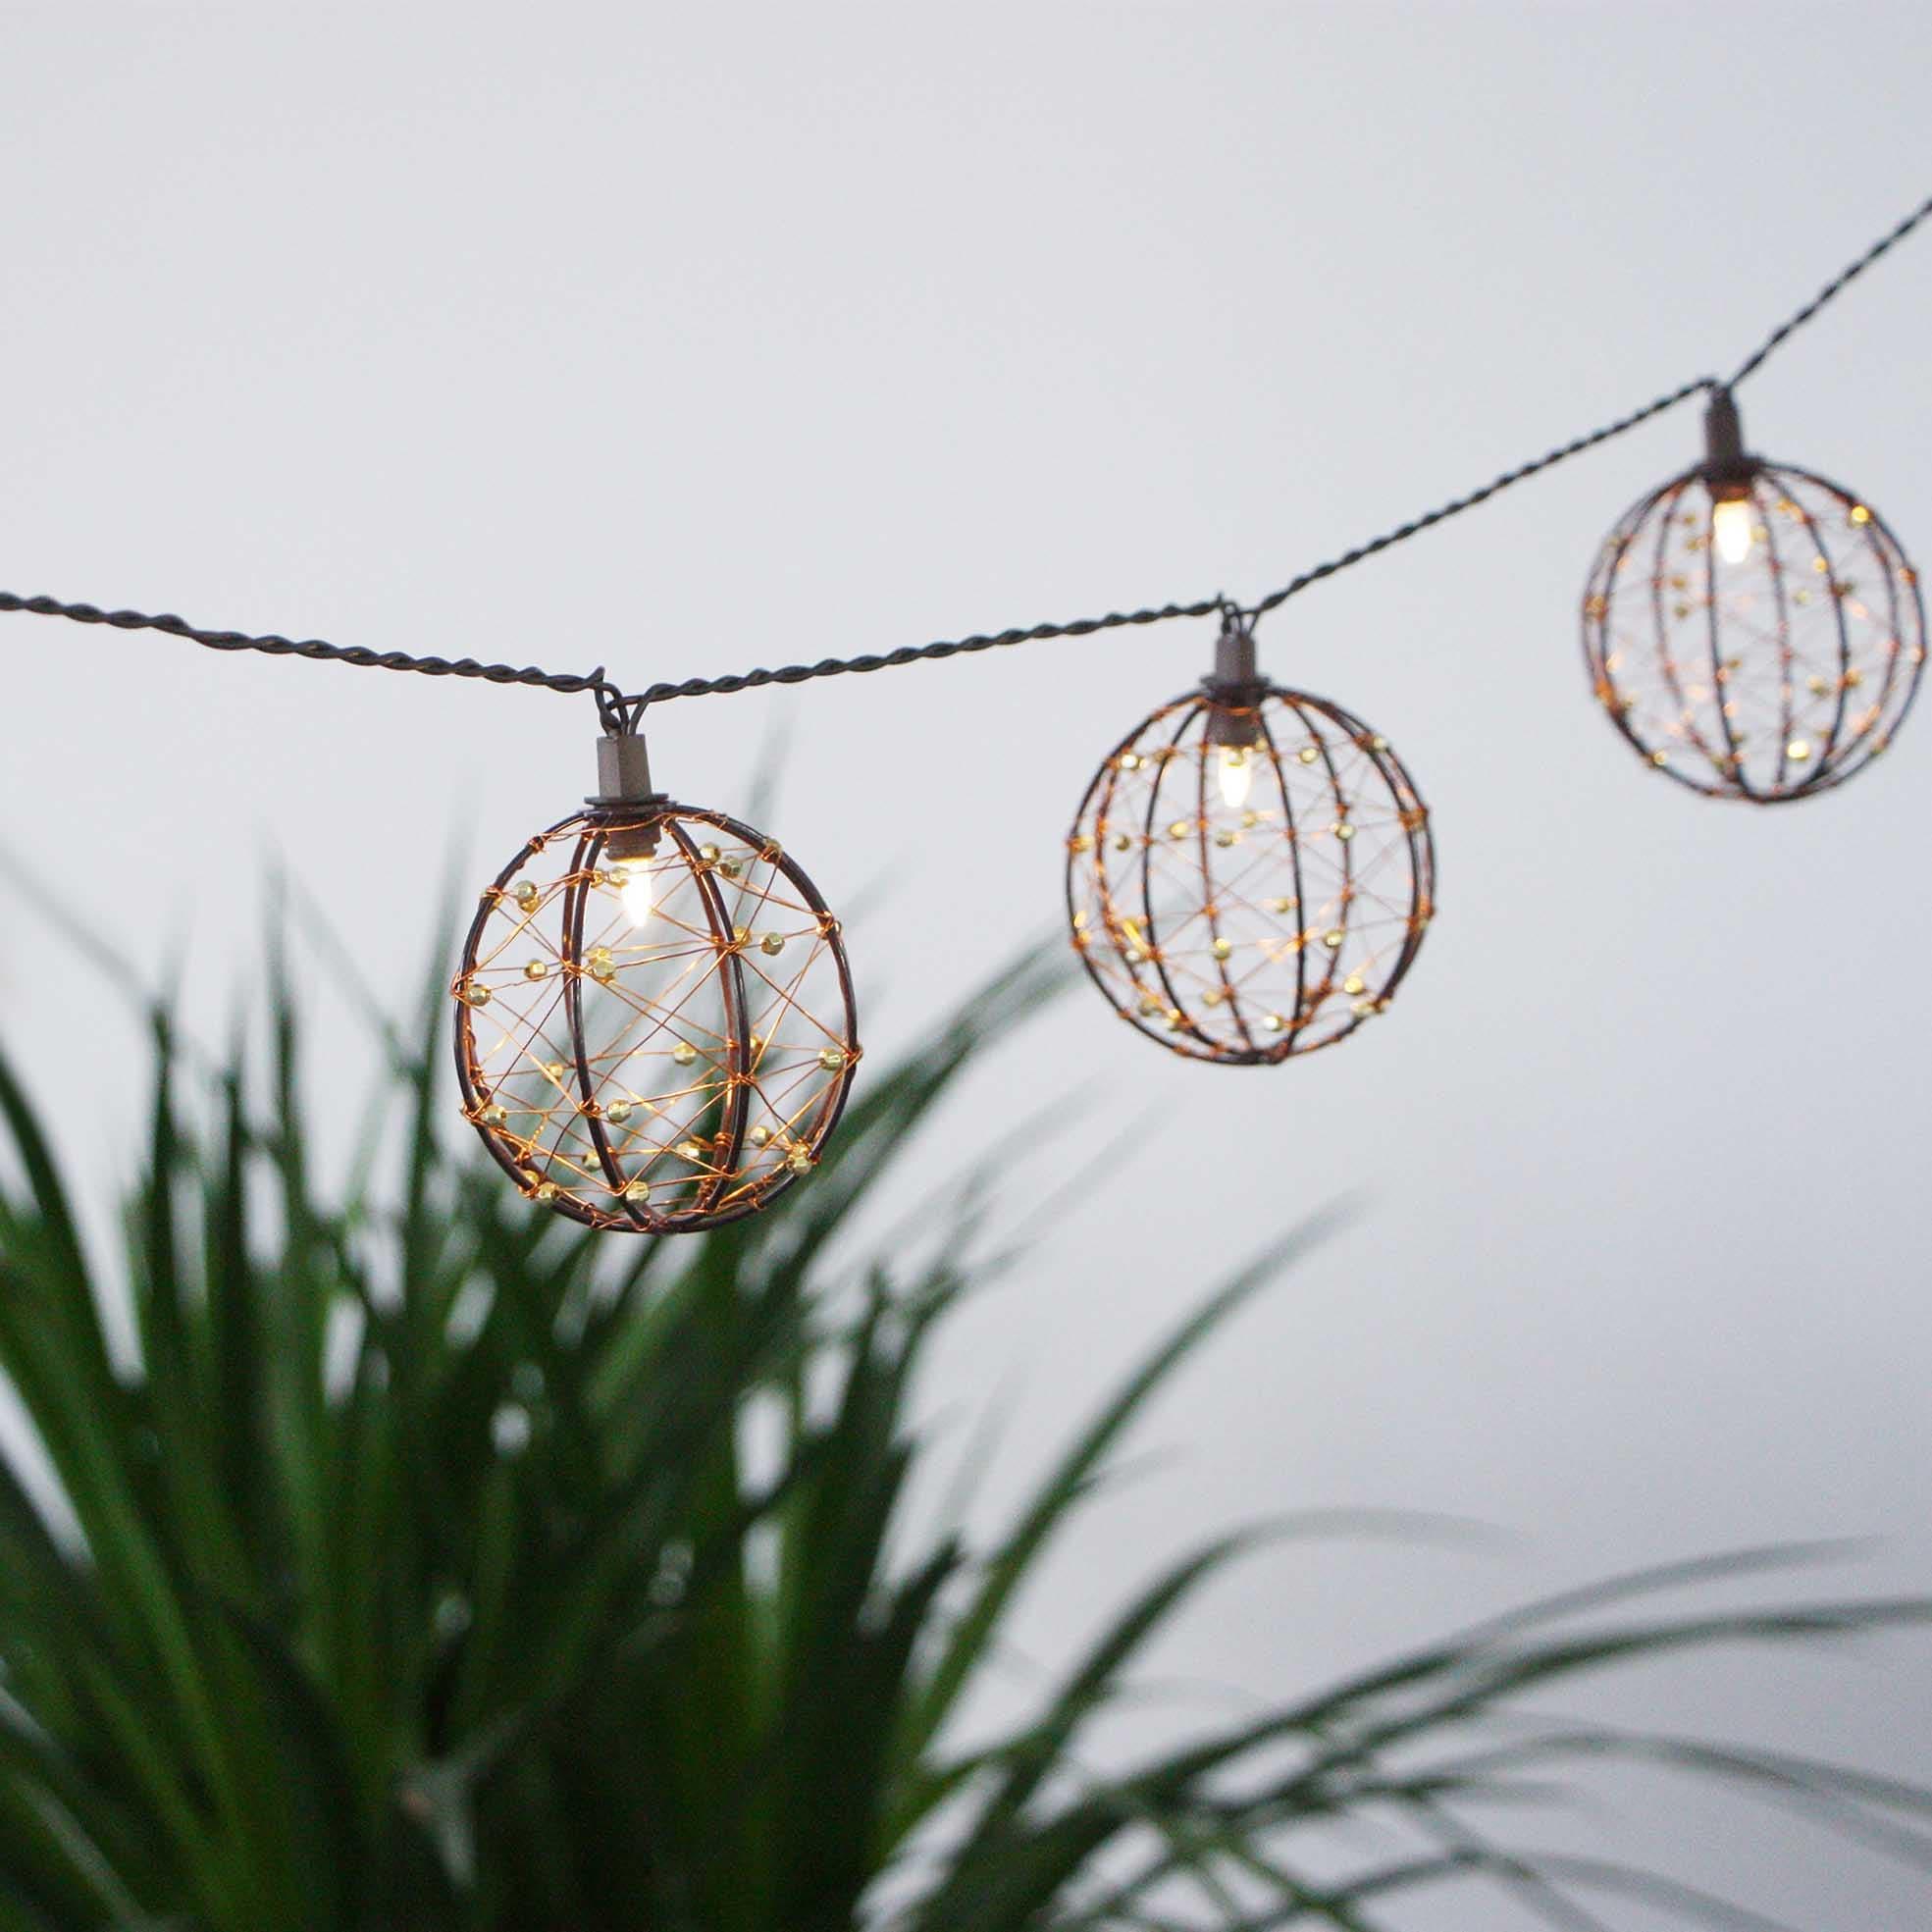 Garden String Light-Decorative Beaded Copper Wire Ball string light